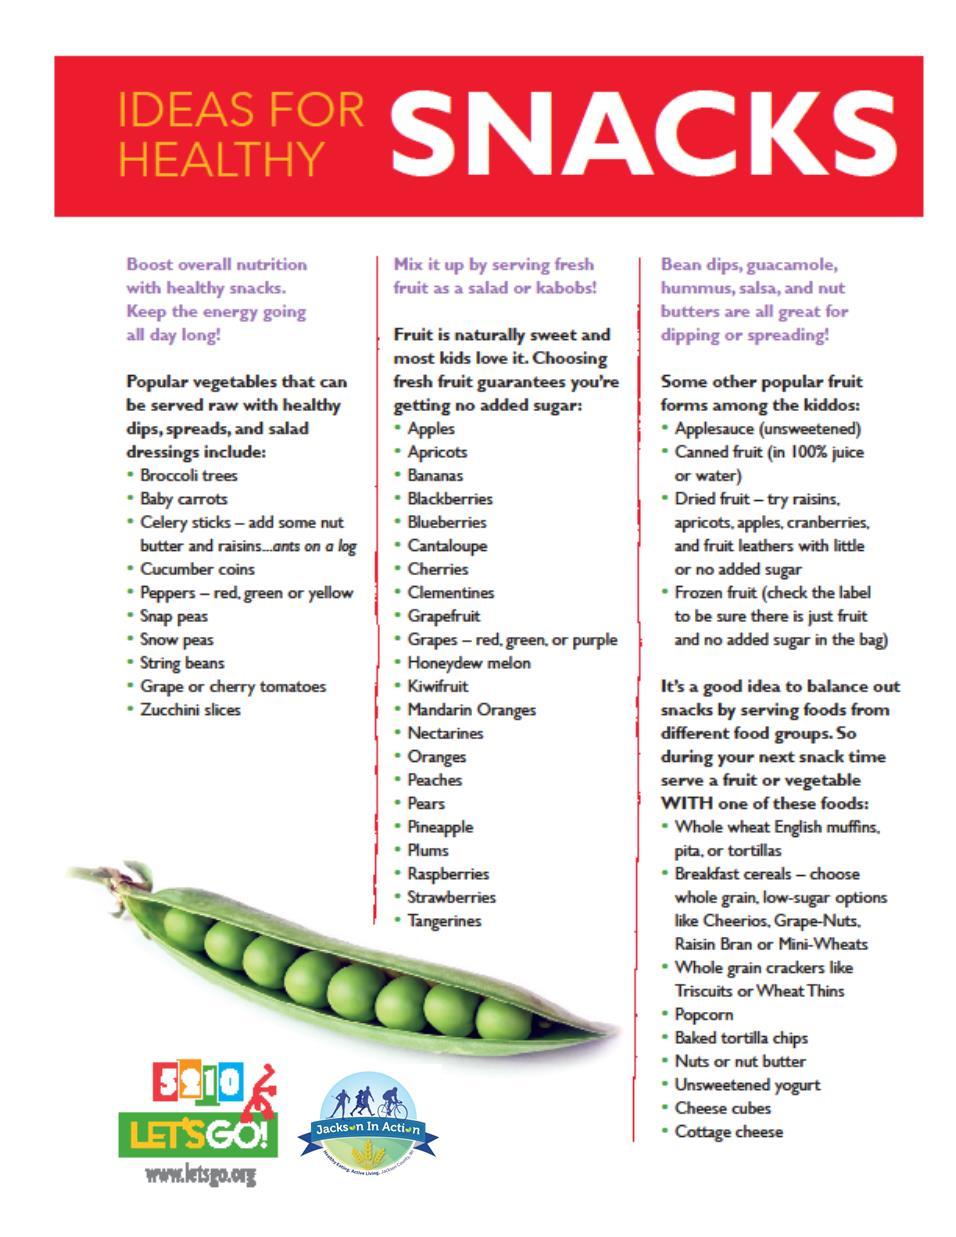 Healthy Snack Ideas.jpg